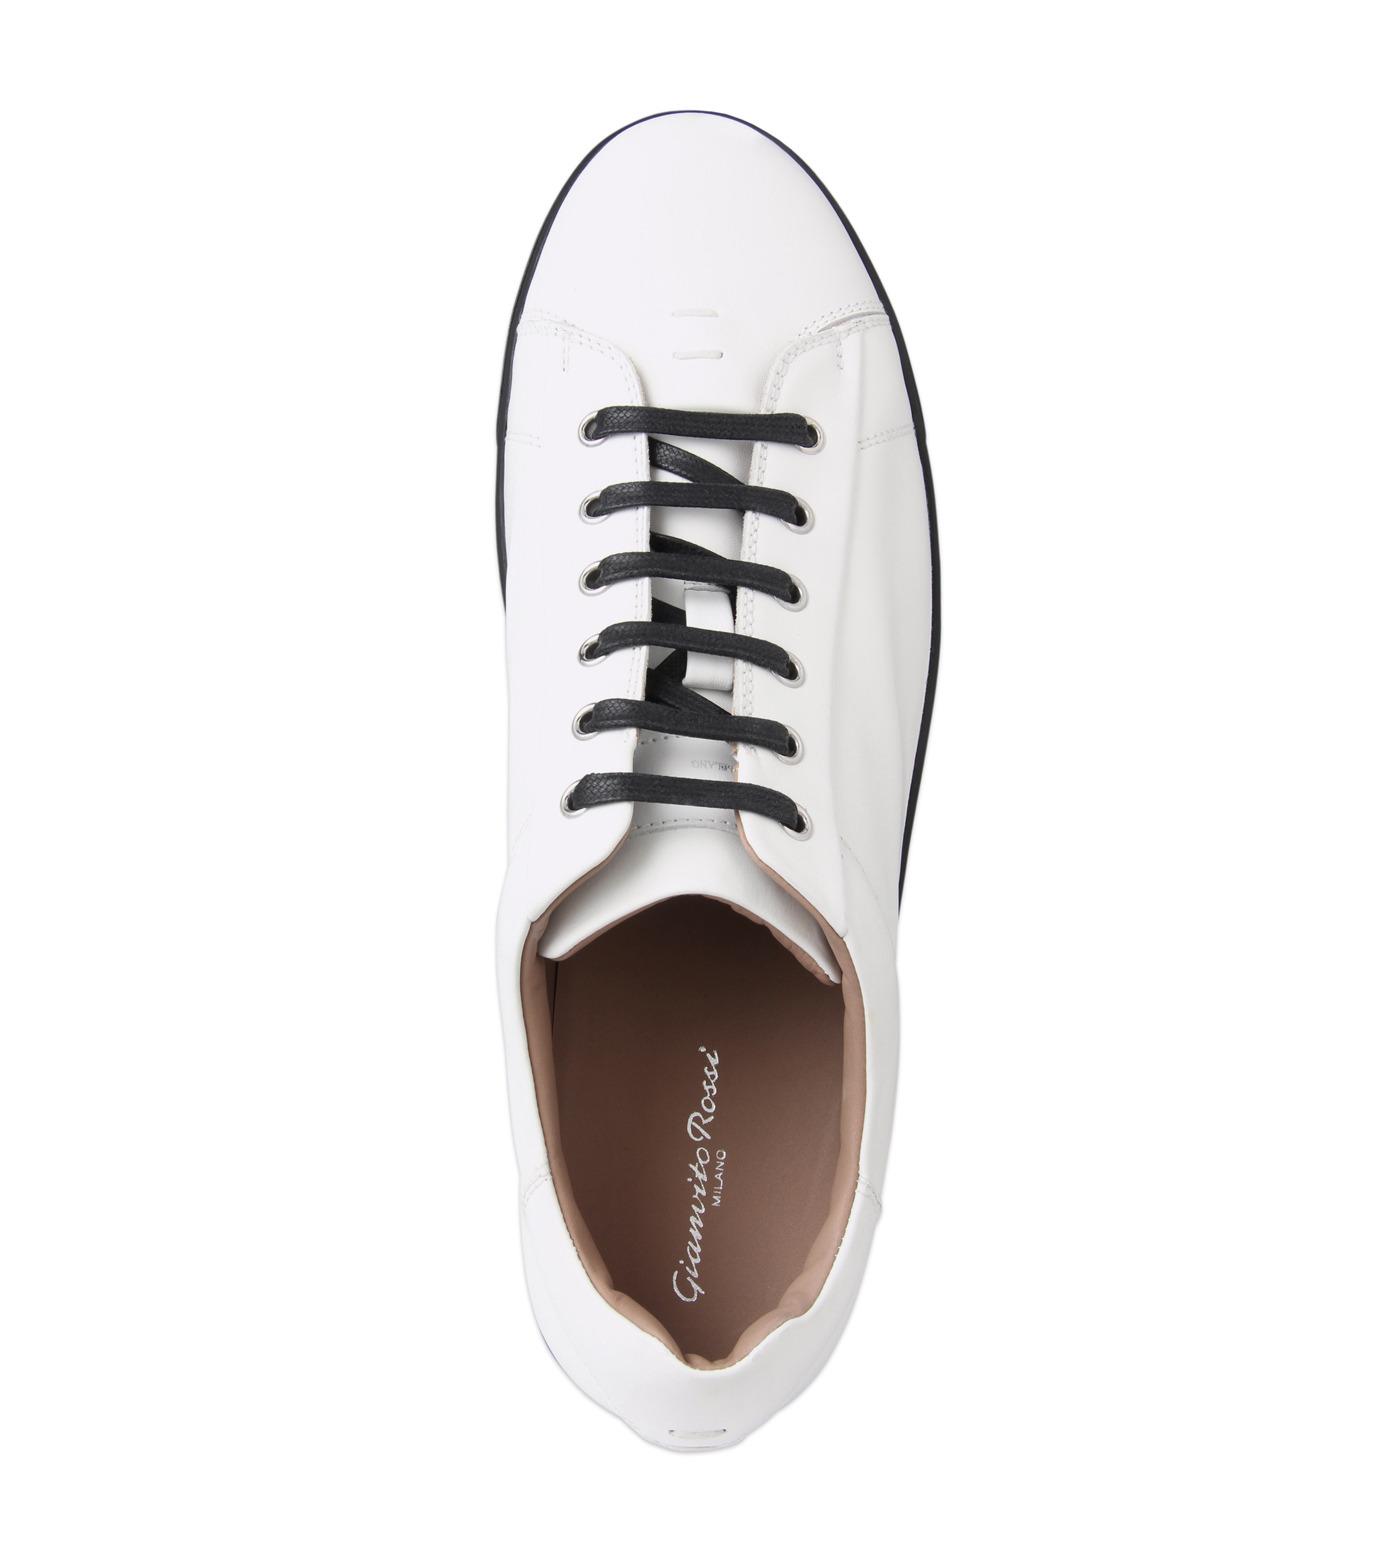 Gianvito Rossi(ジャンヴィト ロッシ)のLowcut Sneaker-WHITE(スニーカー/sneaker)-S26340-4 拡大詳細画像4